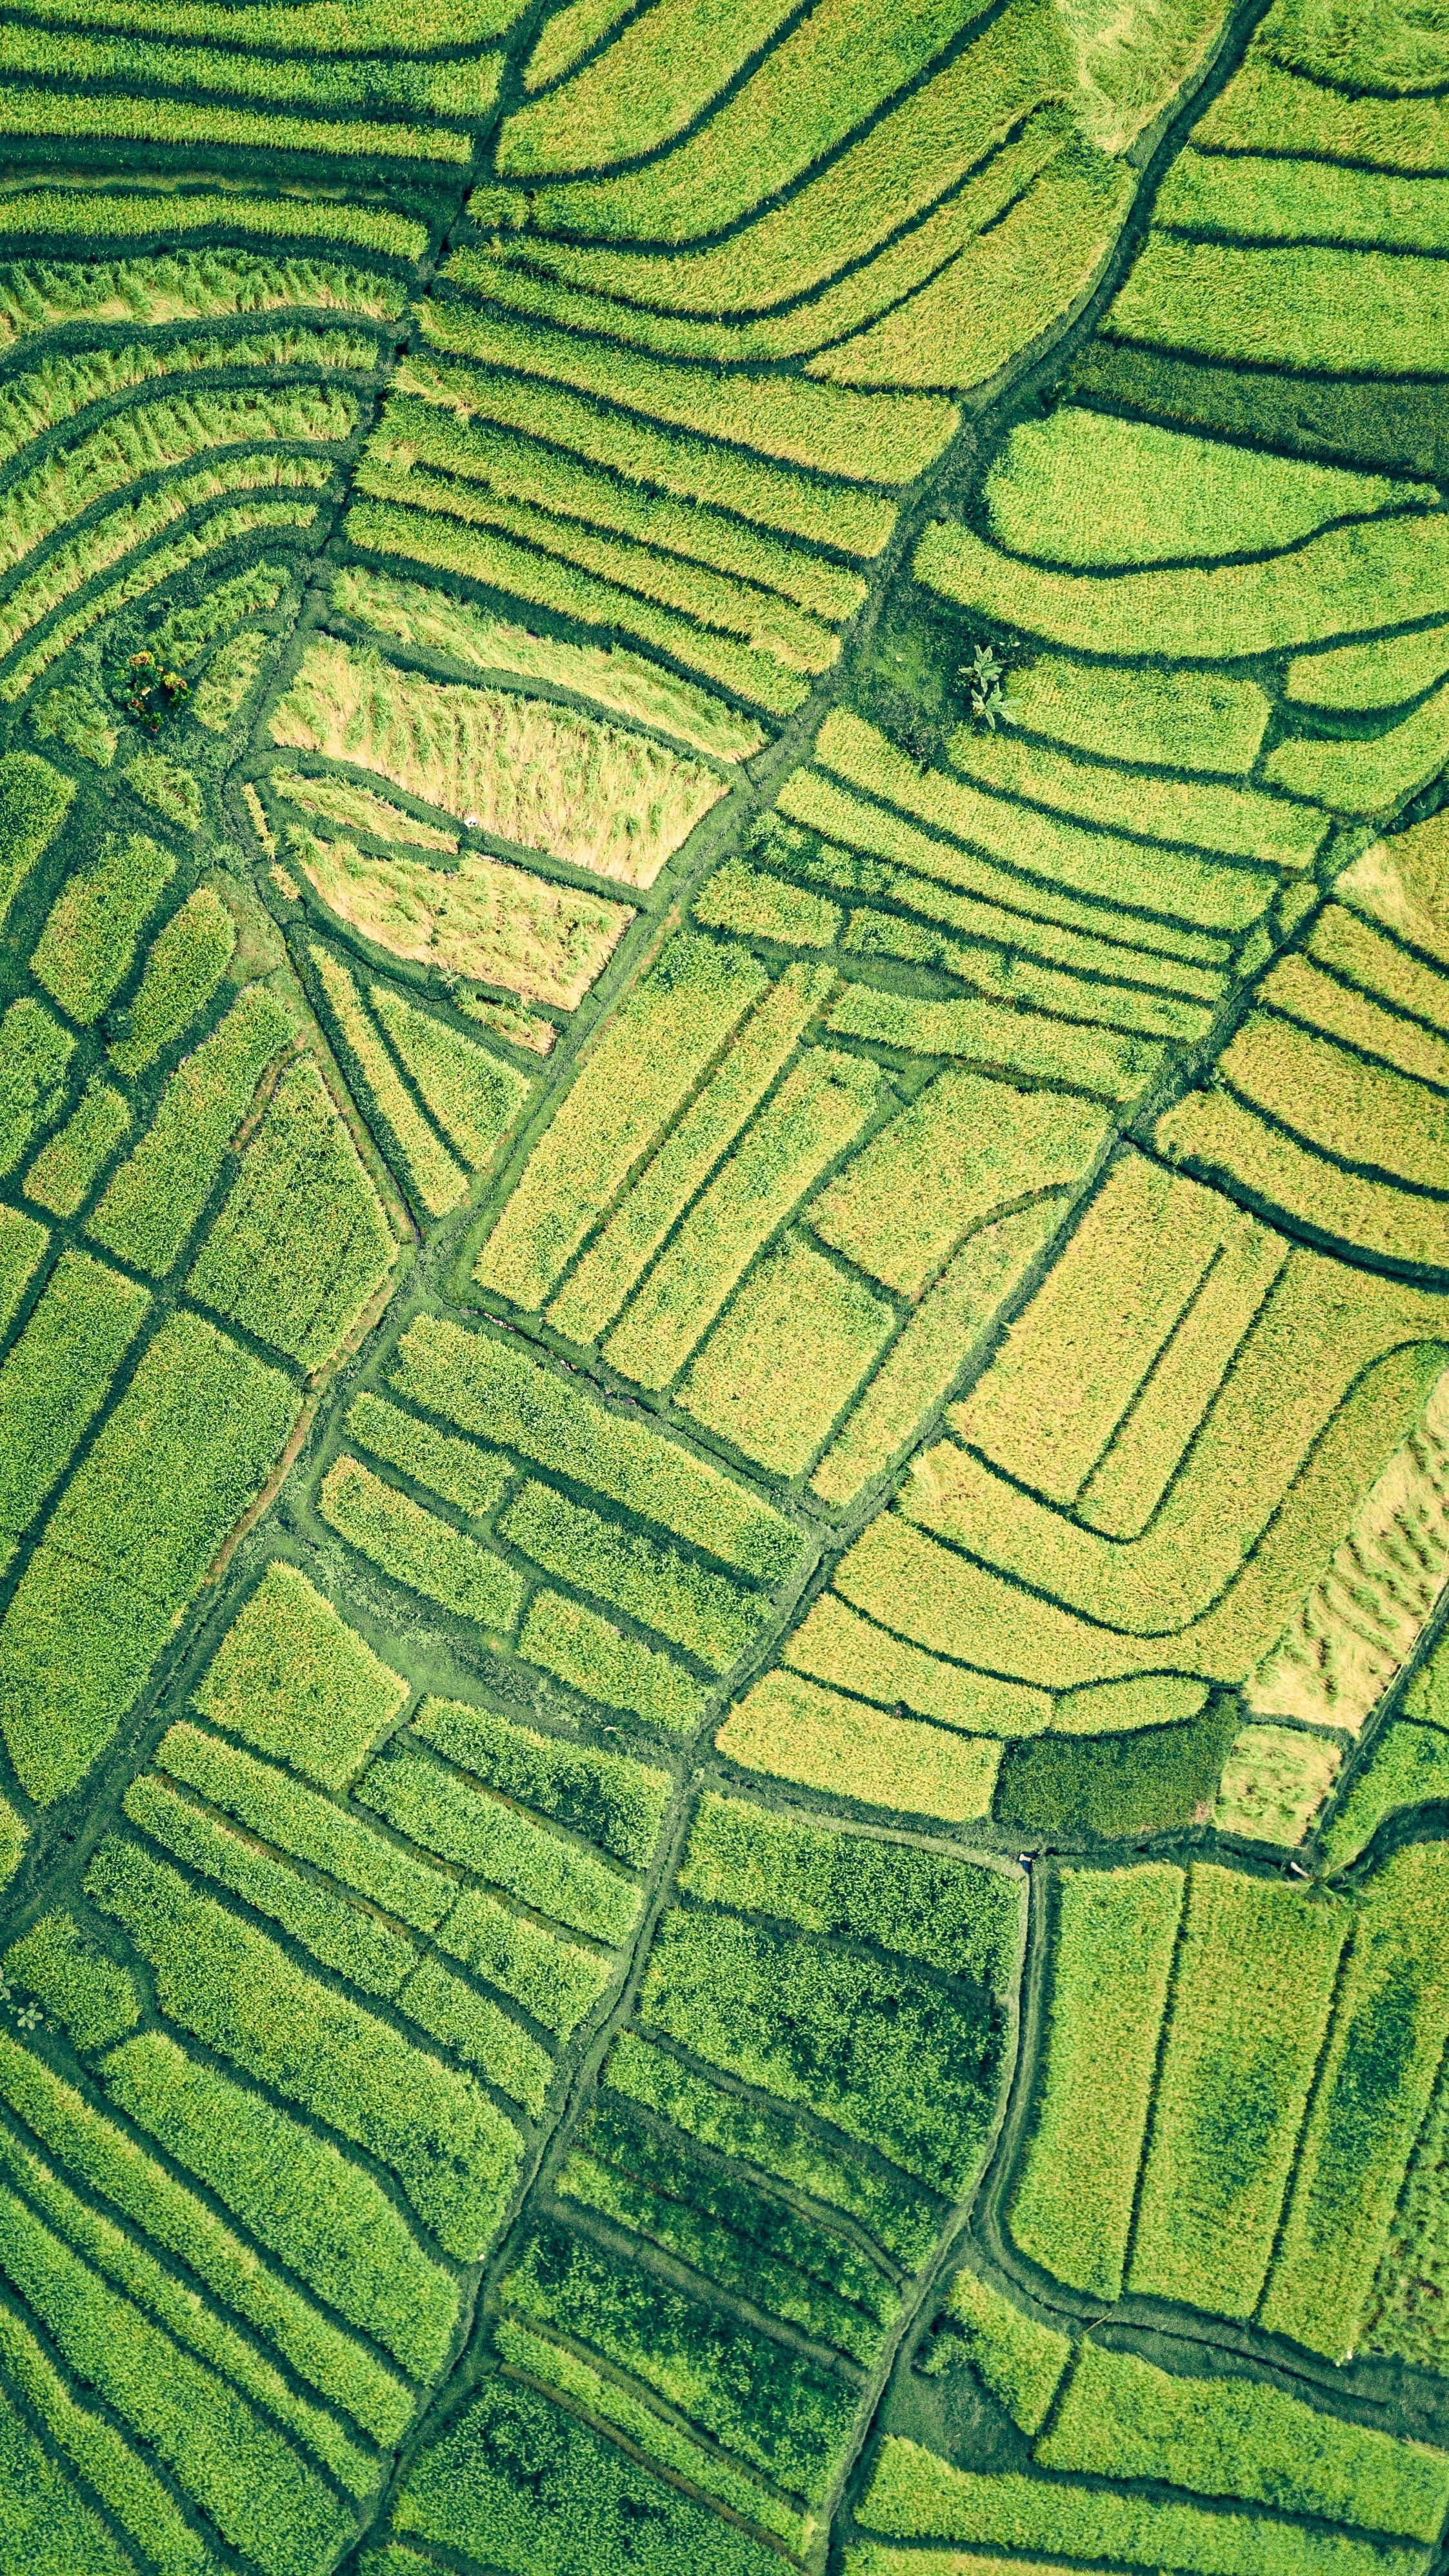 image of land